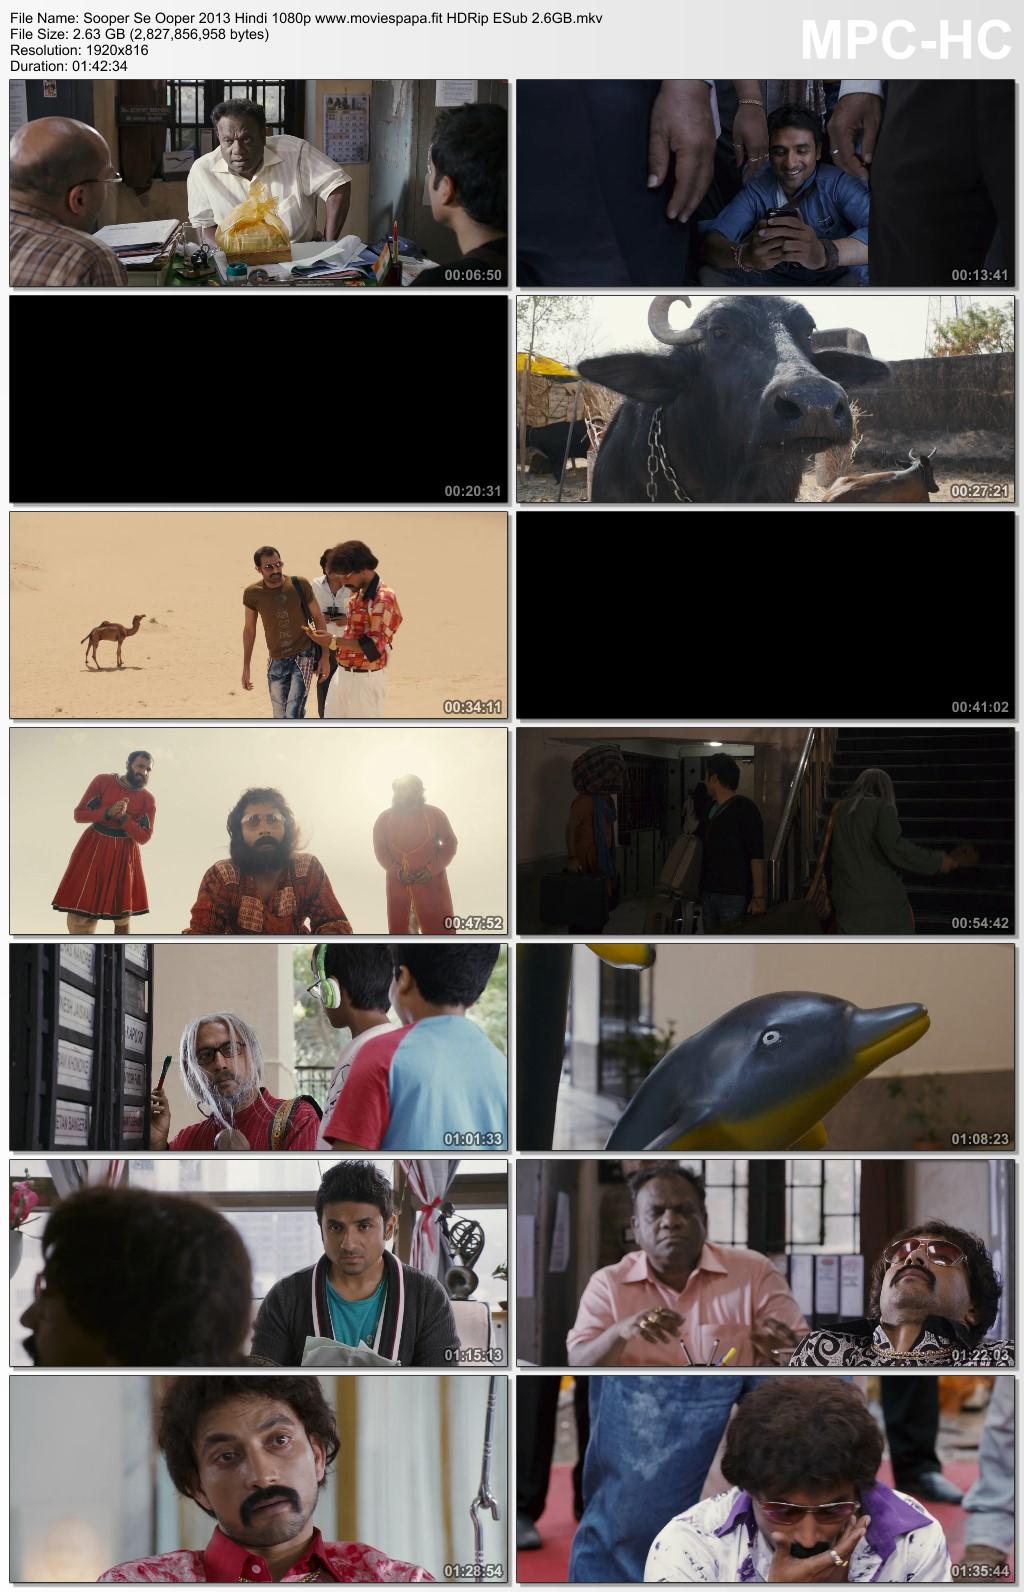 Sooper Se Ooper 2013 Hindi Movie 1080p HDRip ESub 2.7GB Download